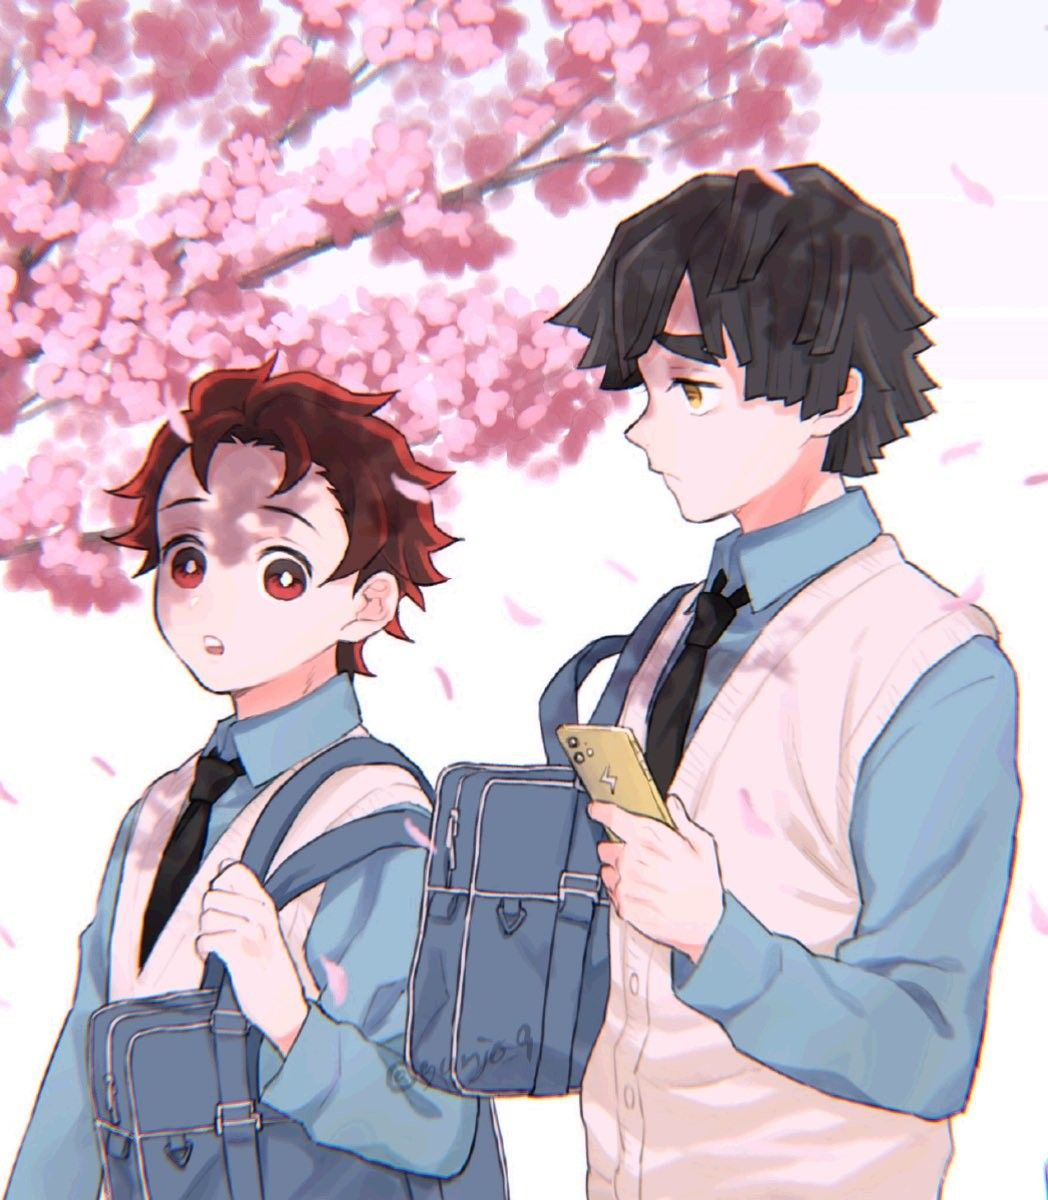 Photo of Yoshiteru and Sumihiko